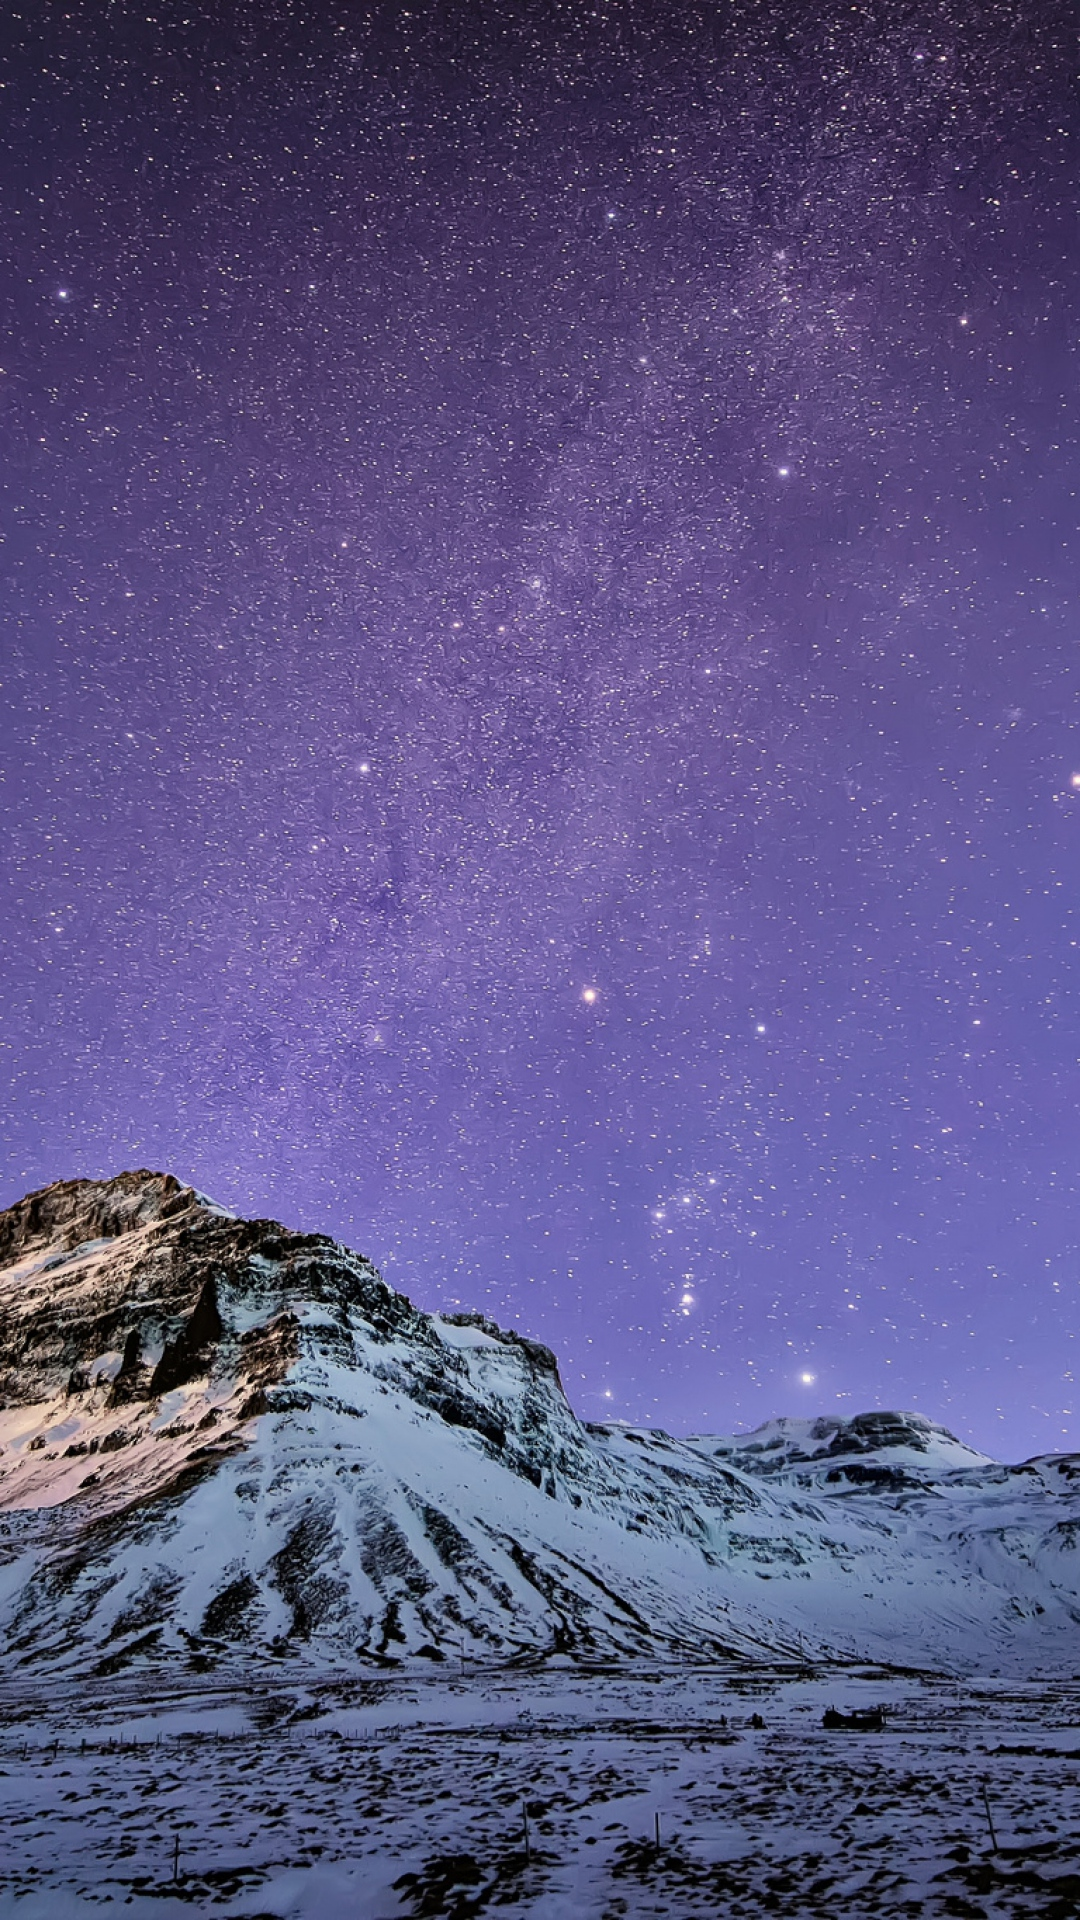 Snow Mountain Stars Wallpaper iPhone 6 Plus preview 1080x1920